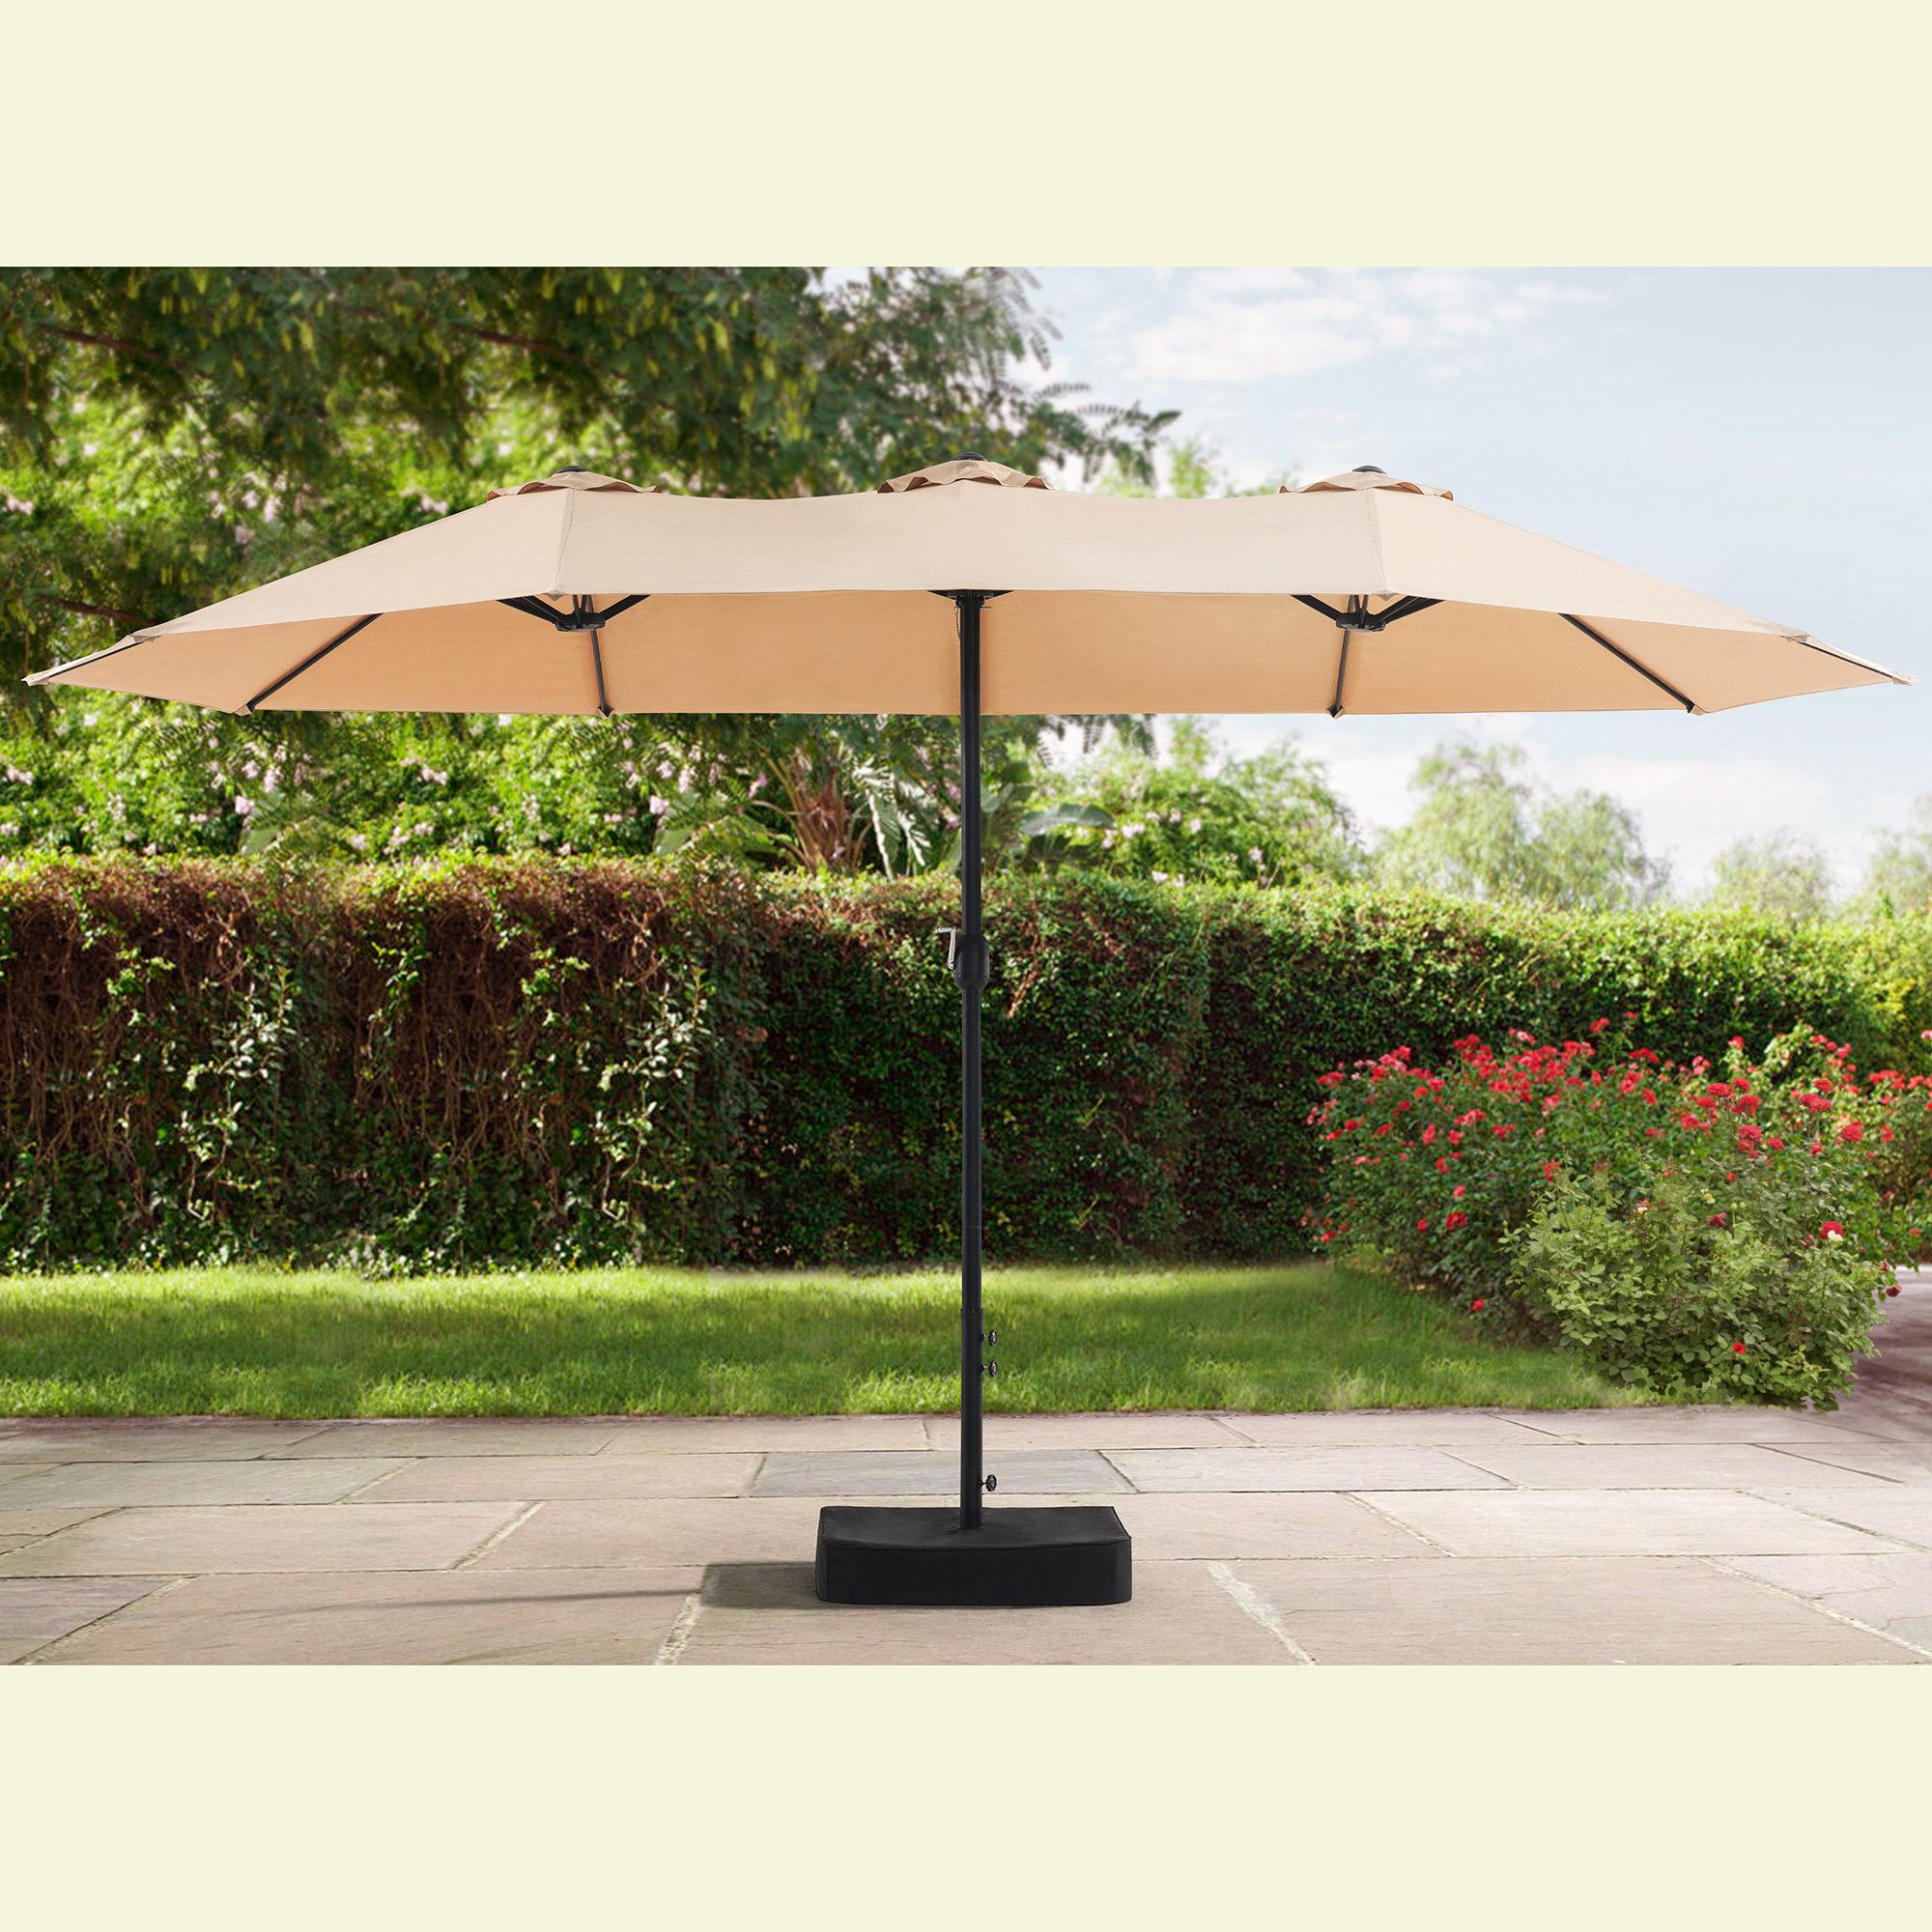 Darby Home Co Clarita 7' X 15' Rectangular Market Umbrella For Most Current Madalyn Rectangular Market Sunbrella Umbrellas (View 4 of 20)